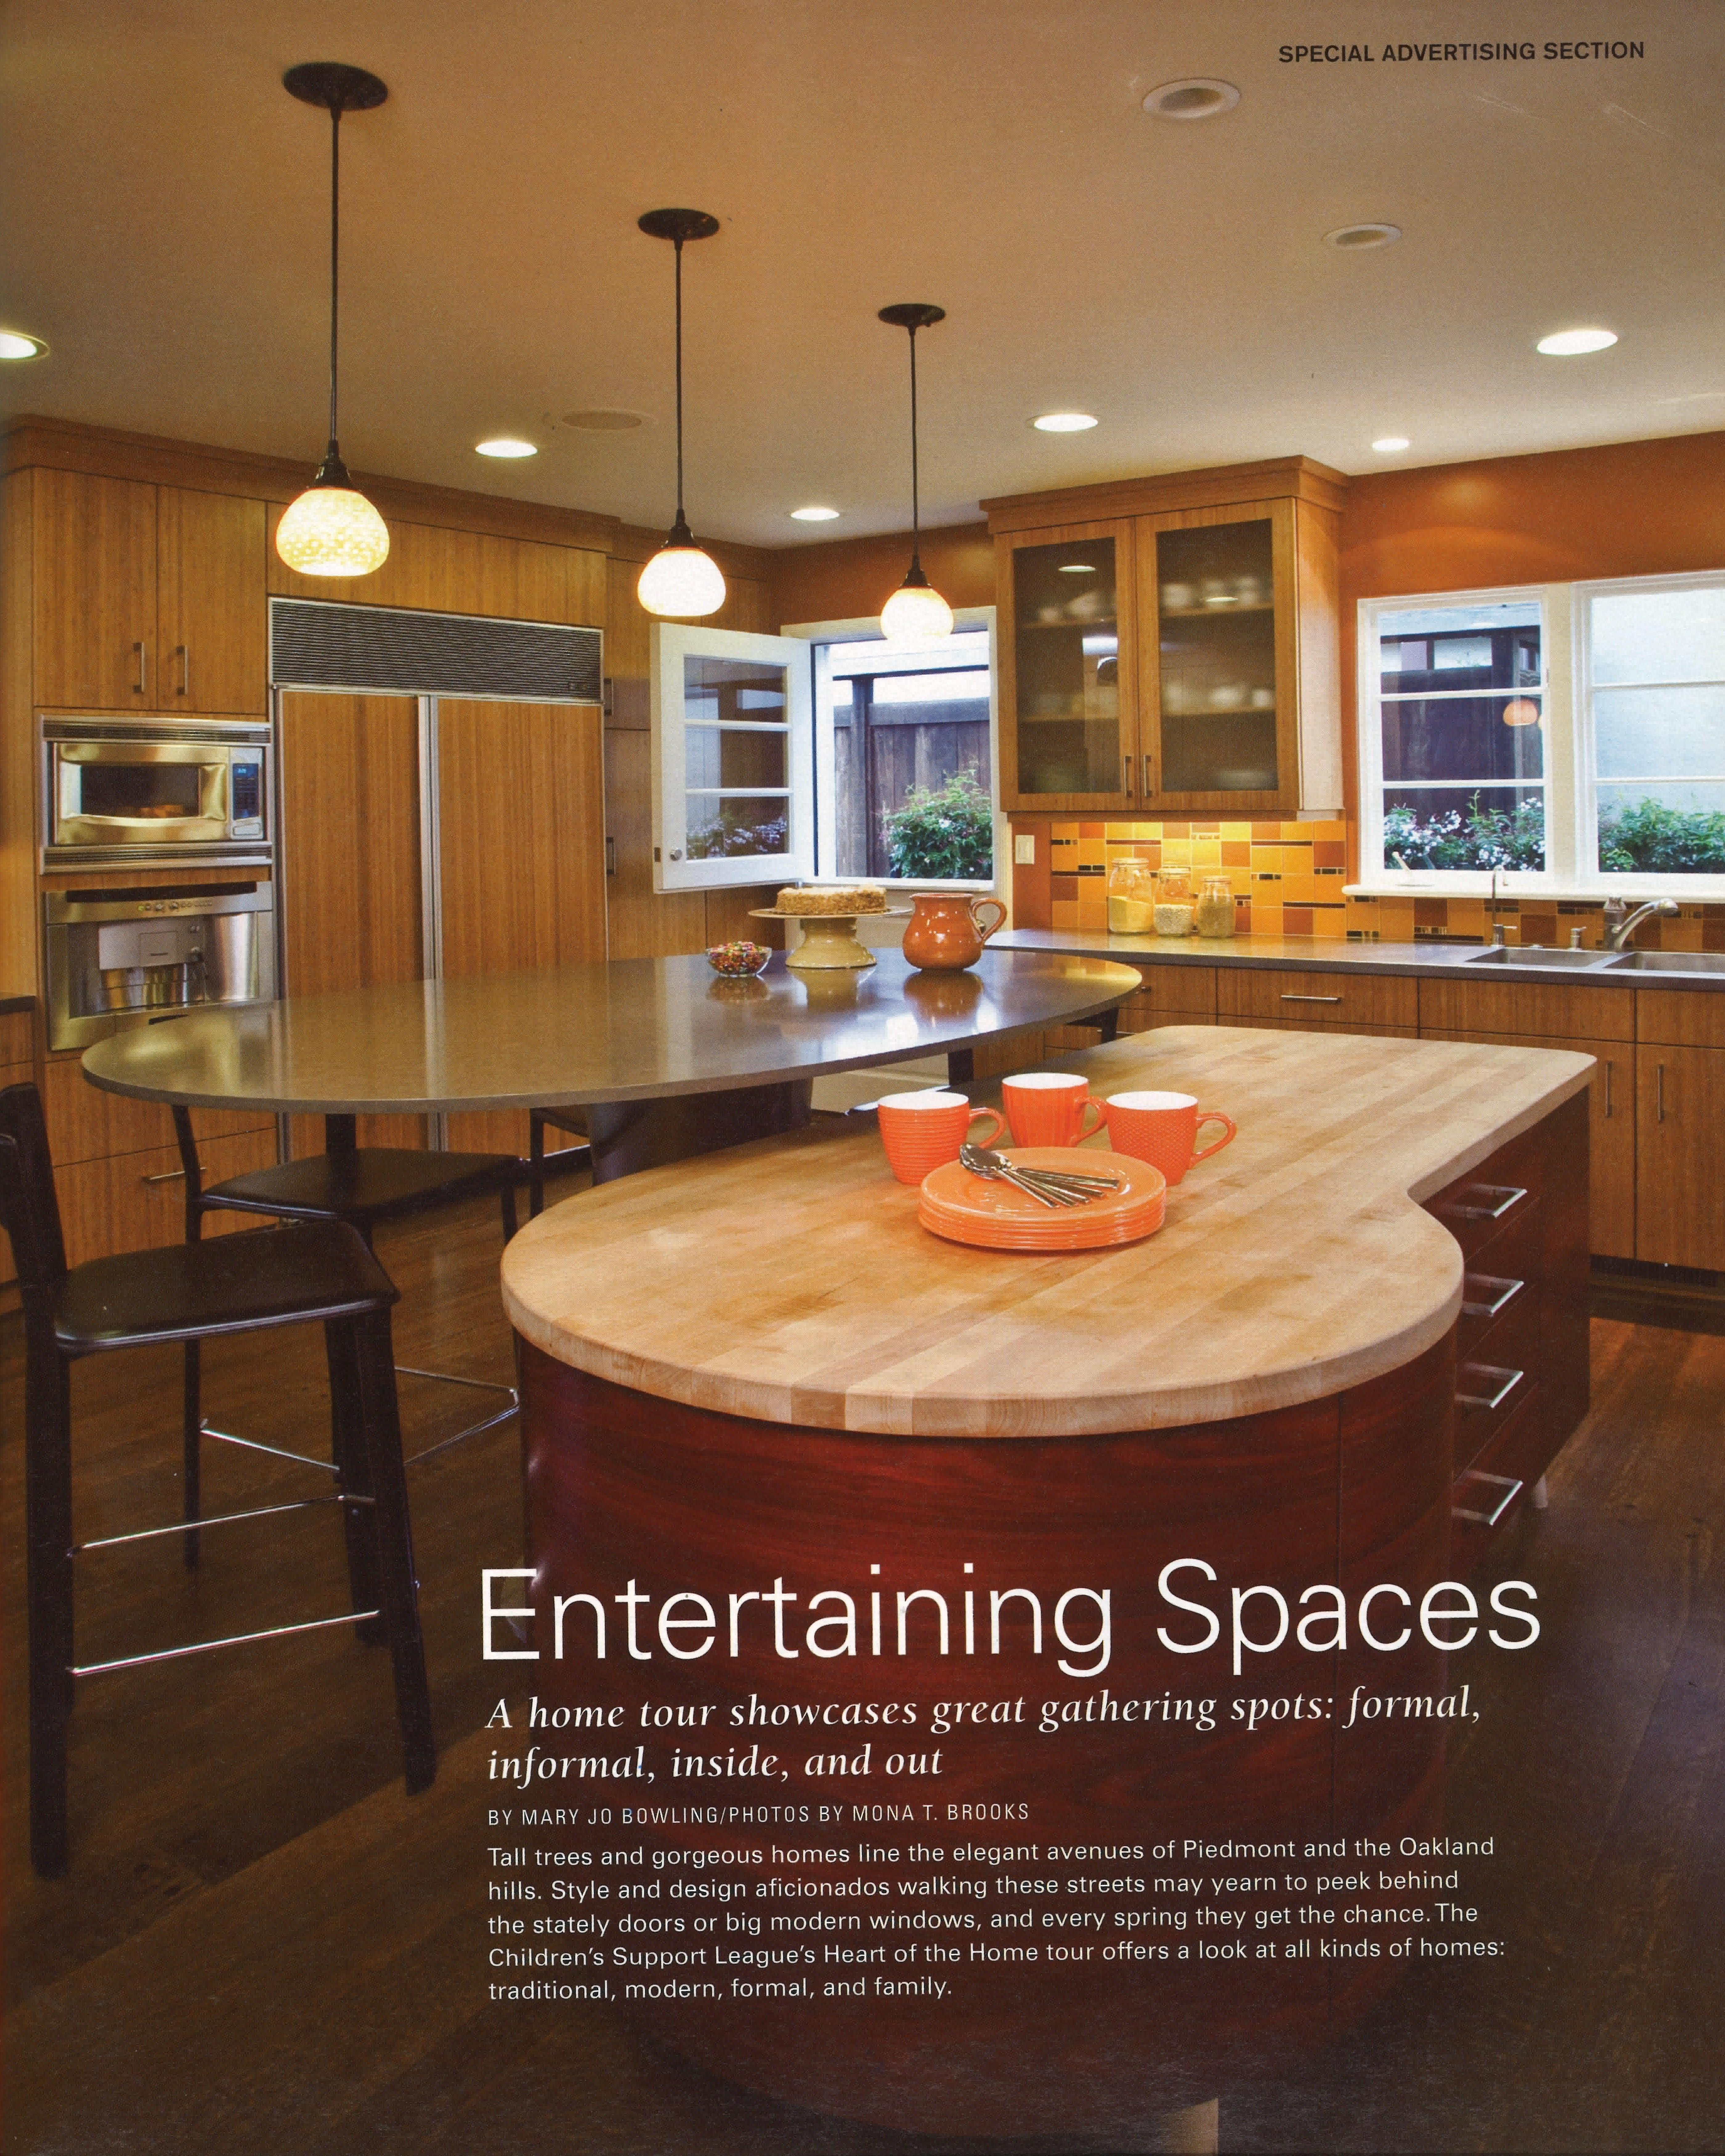 Custom kitchens by john wilkins - Sf Magazine